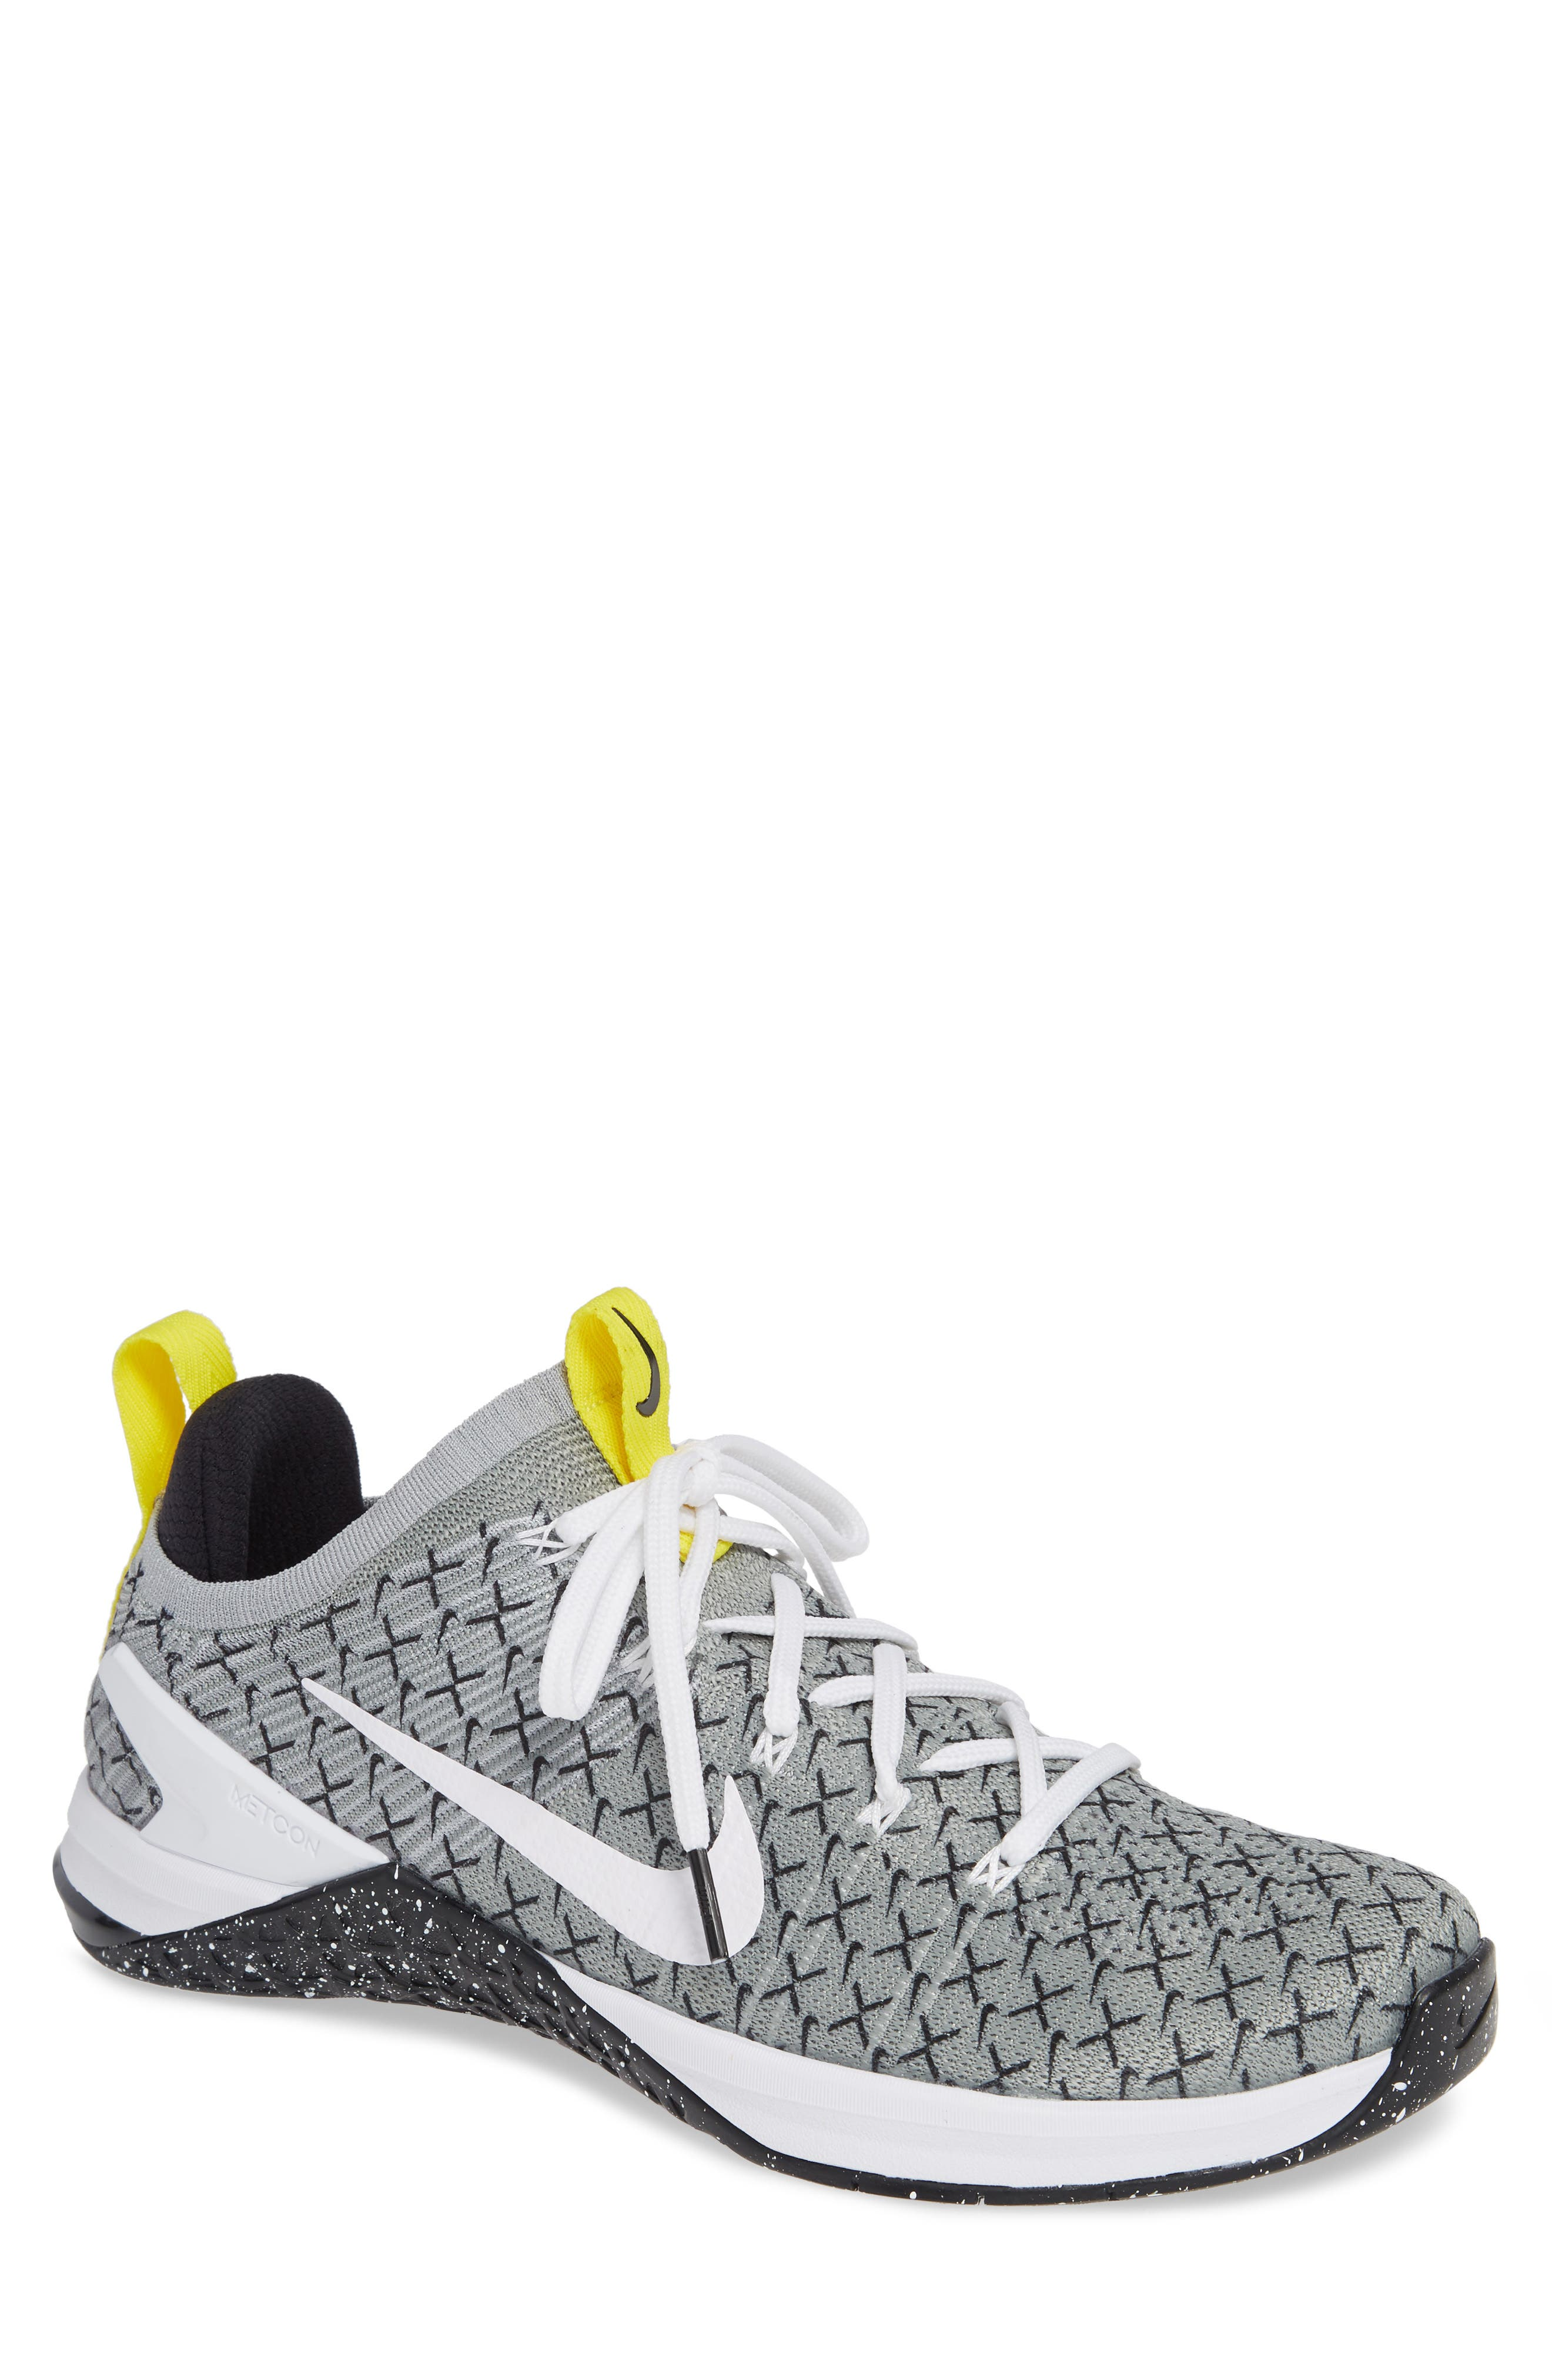 Metcon DSX Flyknit 2 Training Shoe,                             Main thumbnail 1, color,                             017